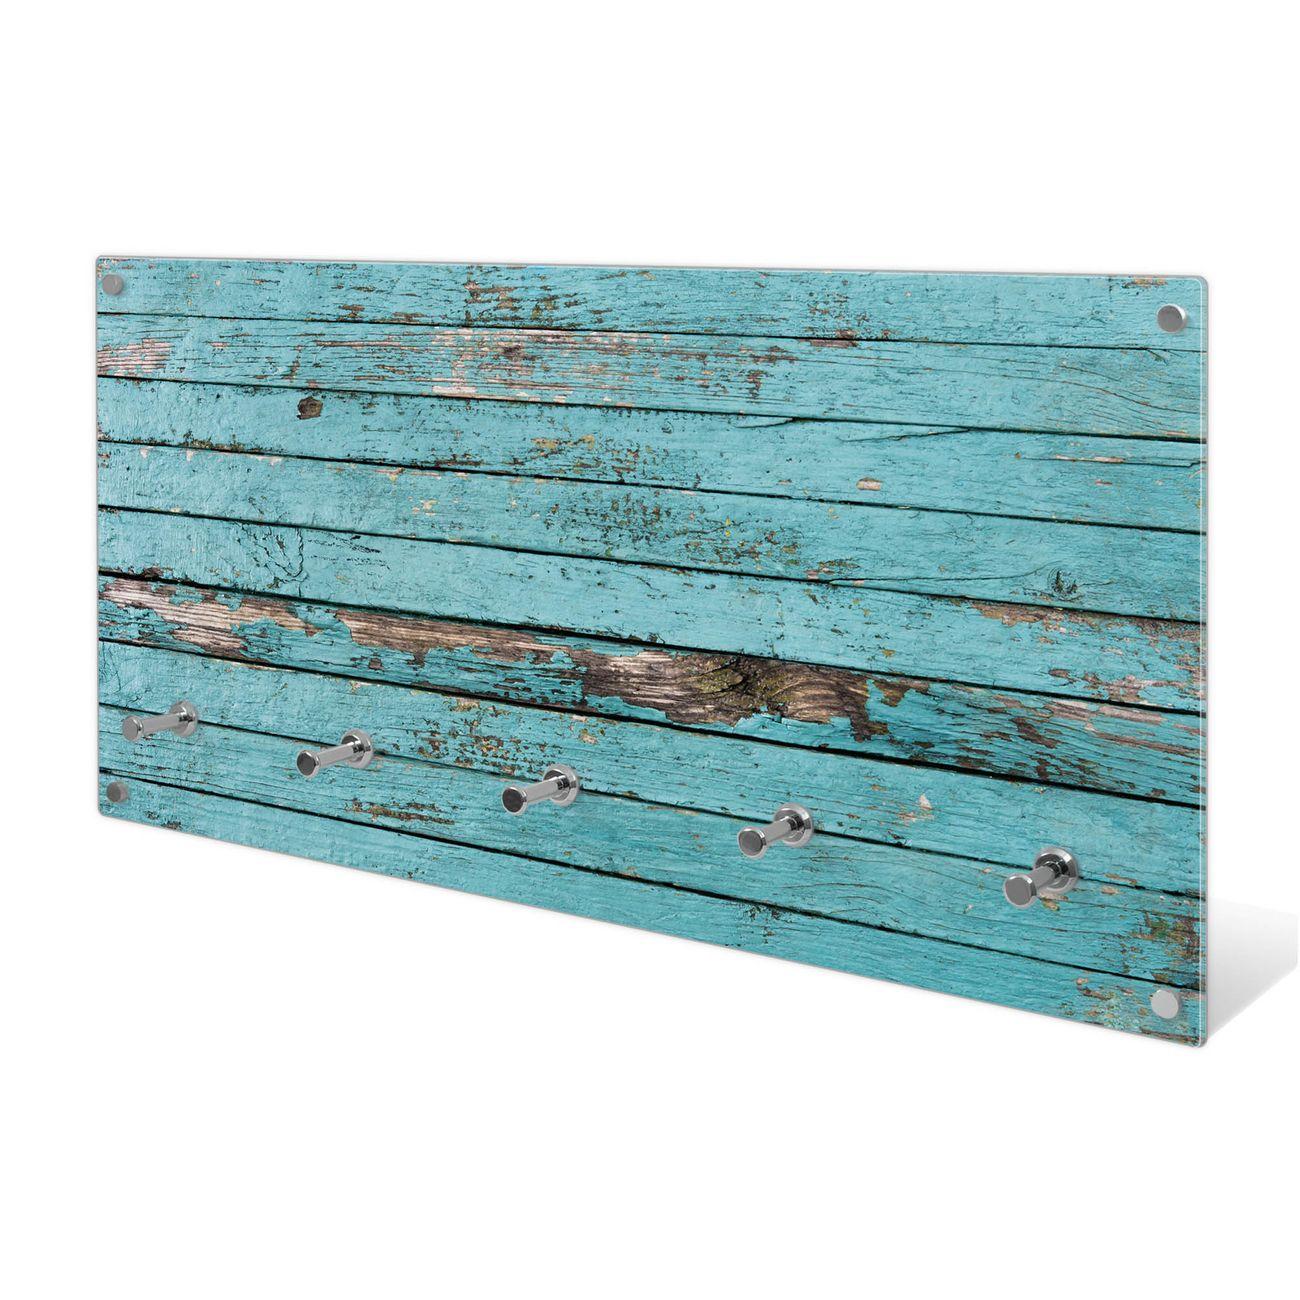 Garderobe aus Glas Motiv Blaue Holzlatten